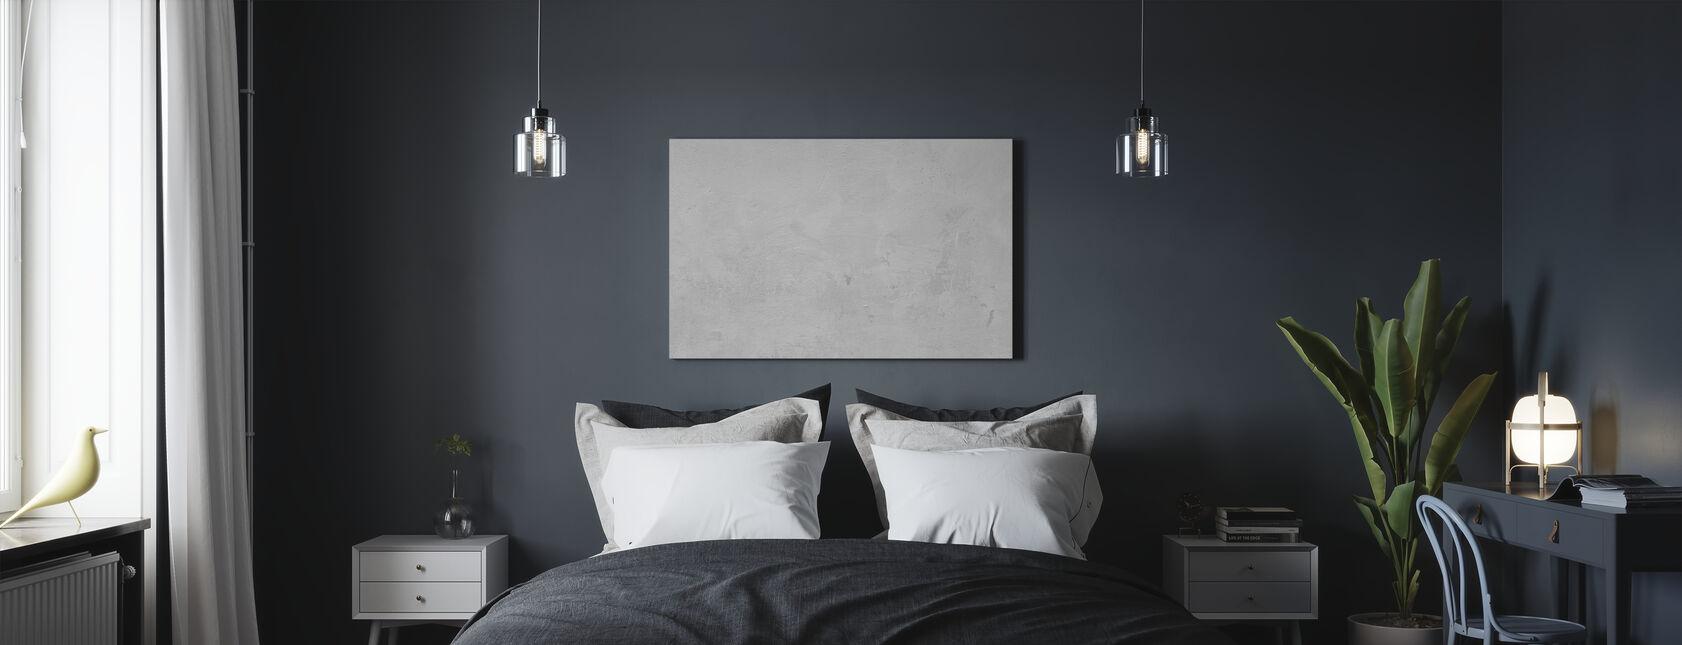 White Concrete Wall - Canvas print - Bedroom